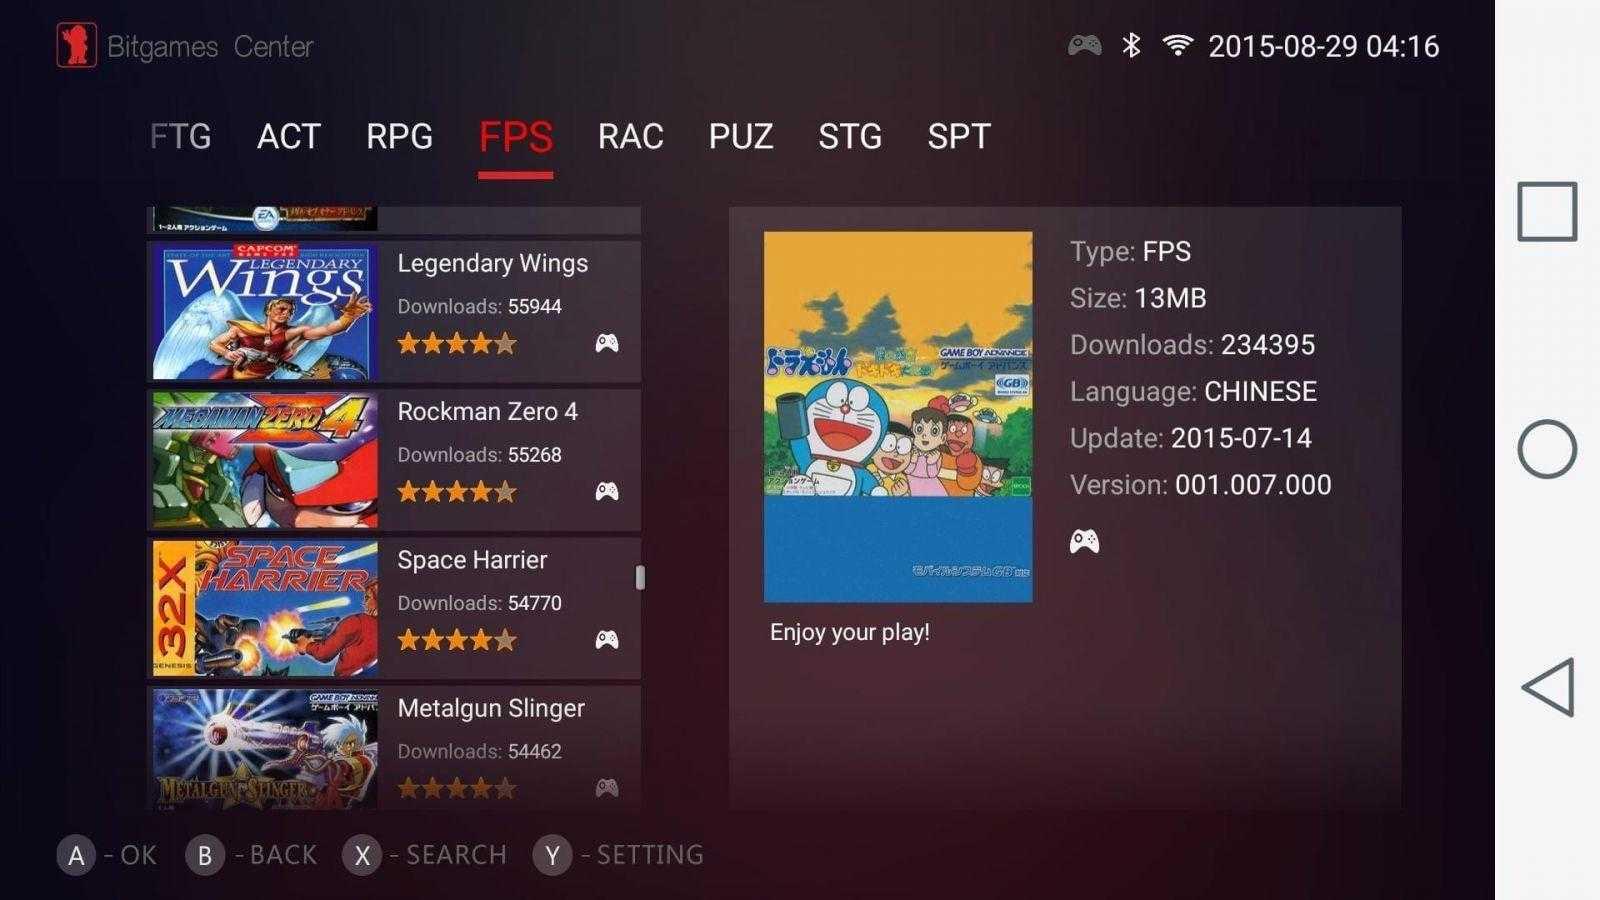 Обзор Bluetooth-геймпада iPega PG-9021 (Screenshot 2015 08 29 04 16 45)